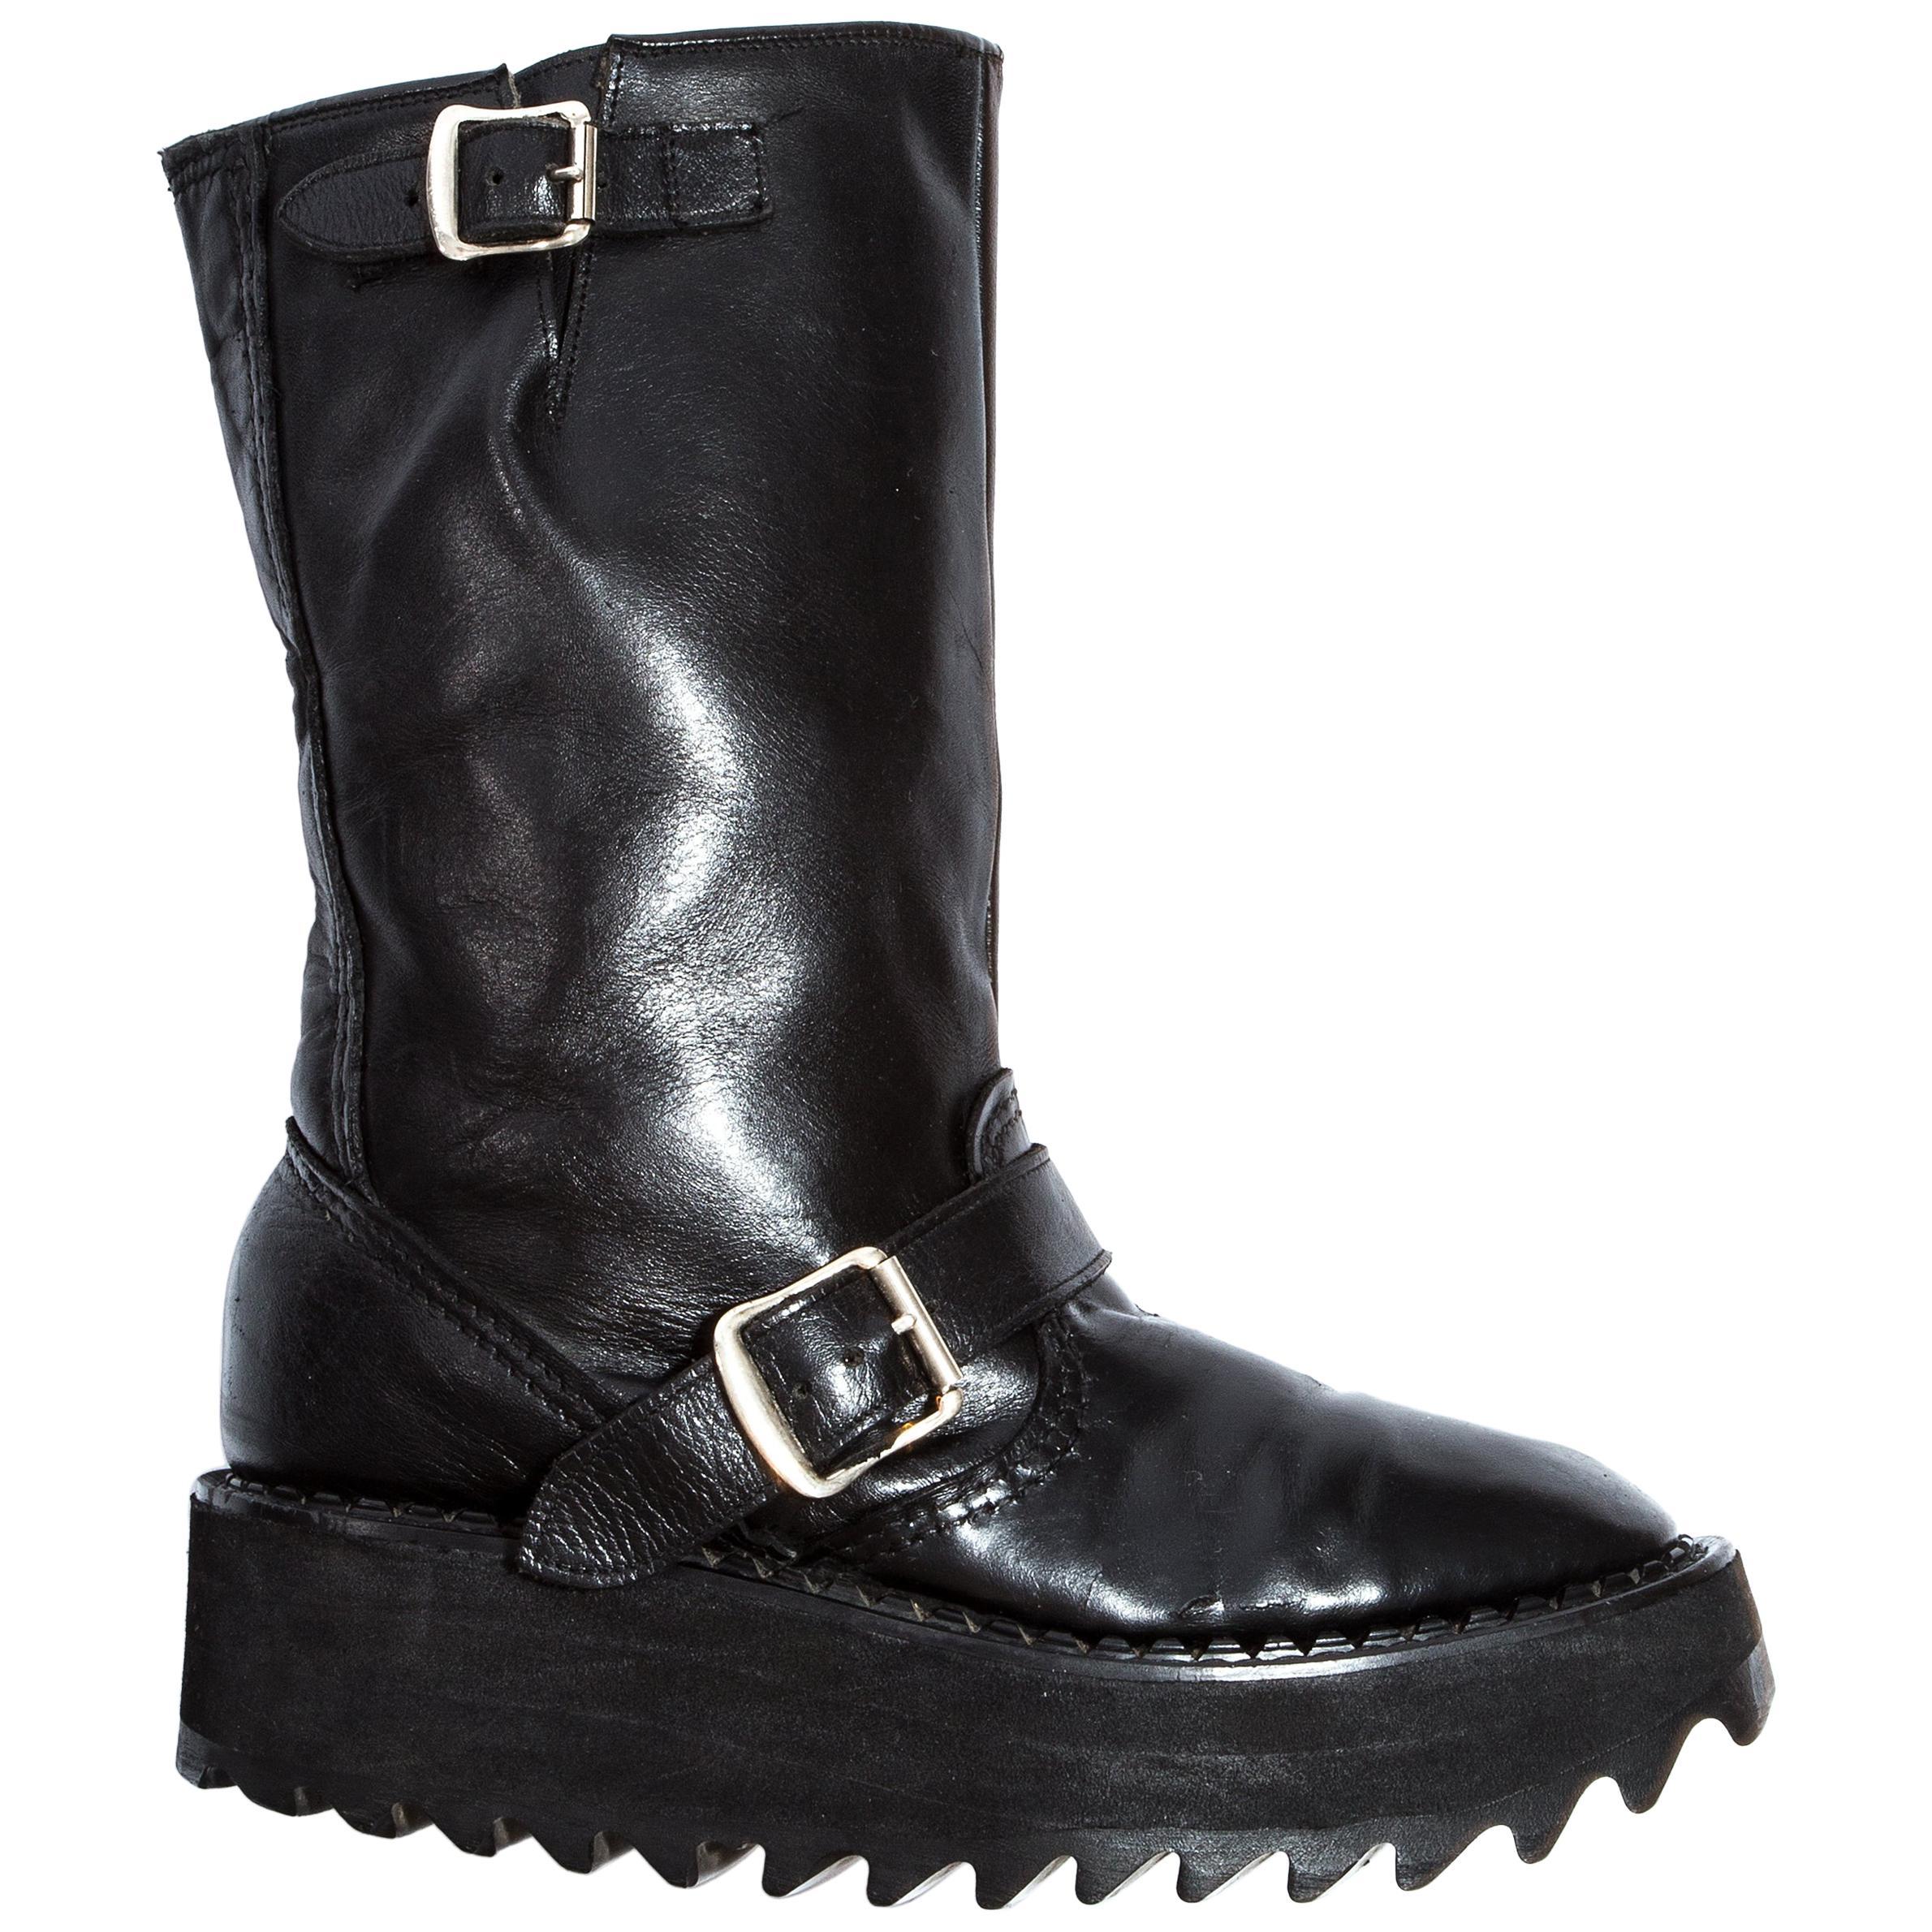 Vivienne Westwood black leather platform buckle boots, ss 1992